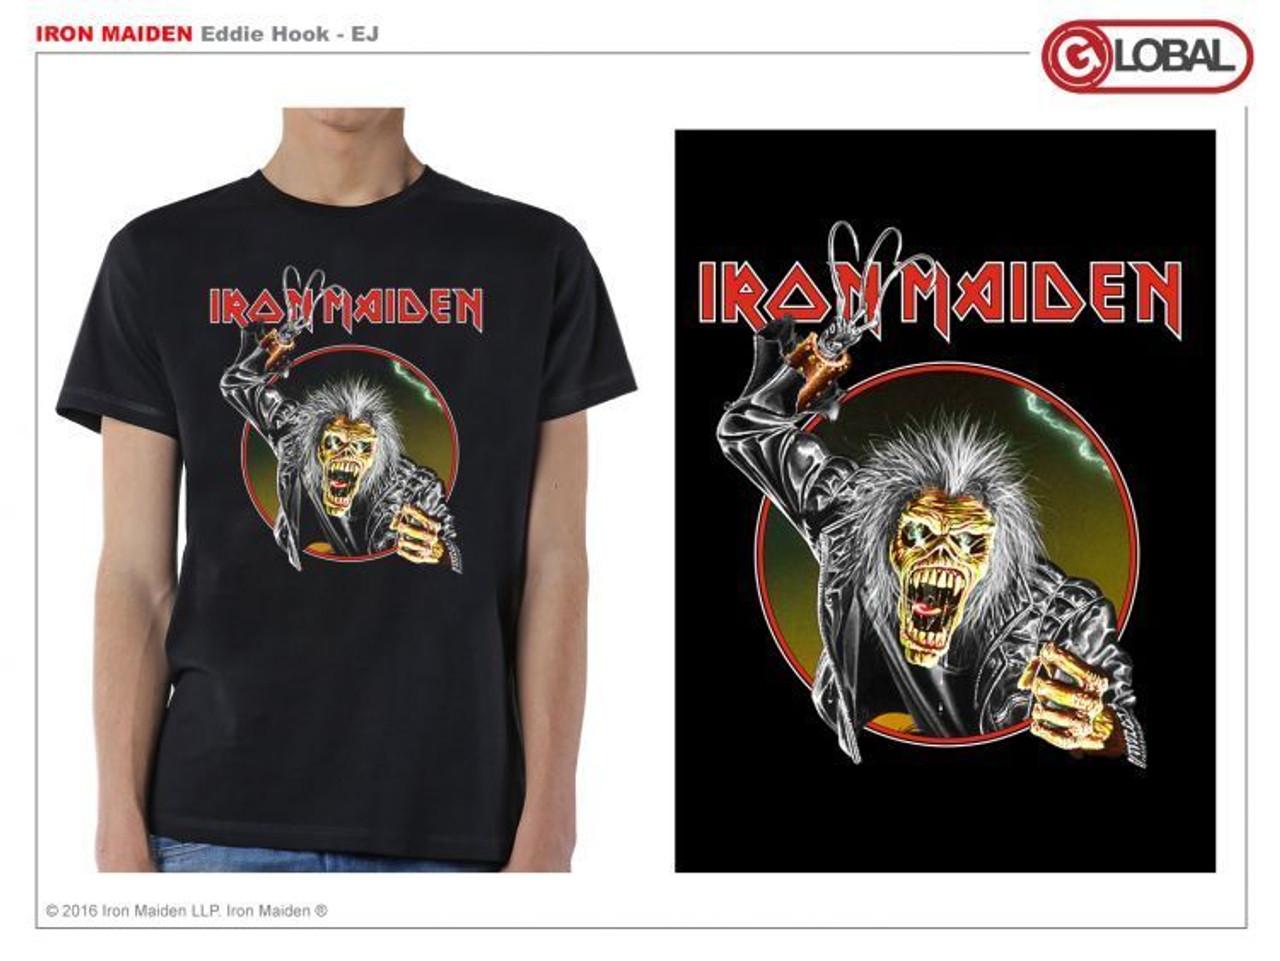 89713ddc Iron Maiden Eddie Hook Metal Music Rock Band Adult Mens T Tee Shirt IRM10237